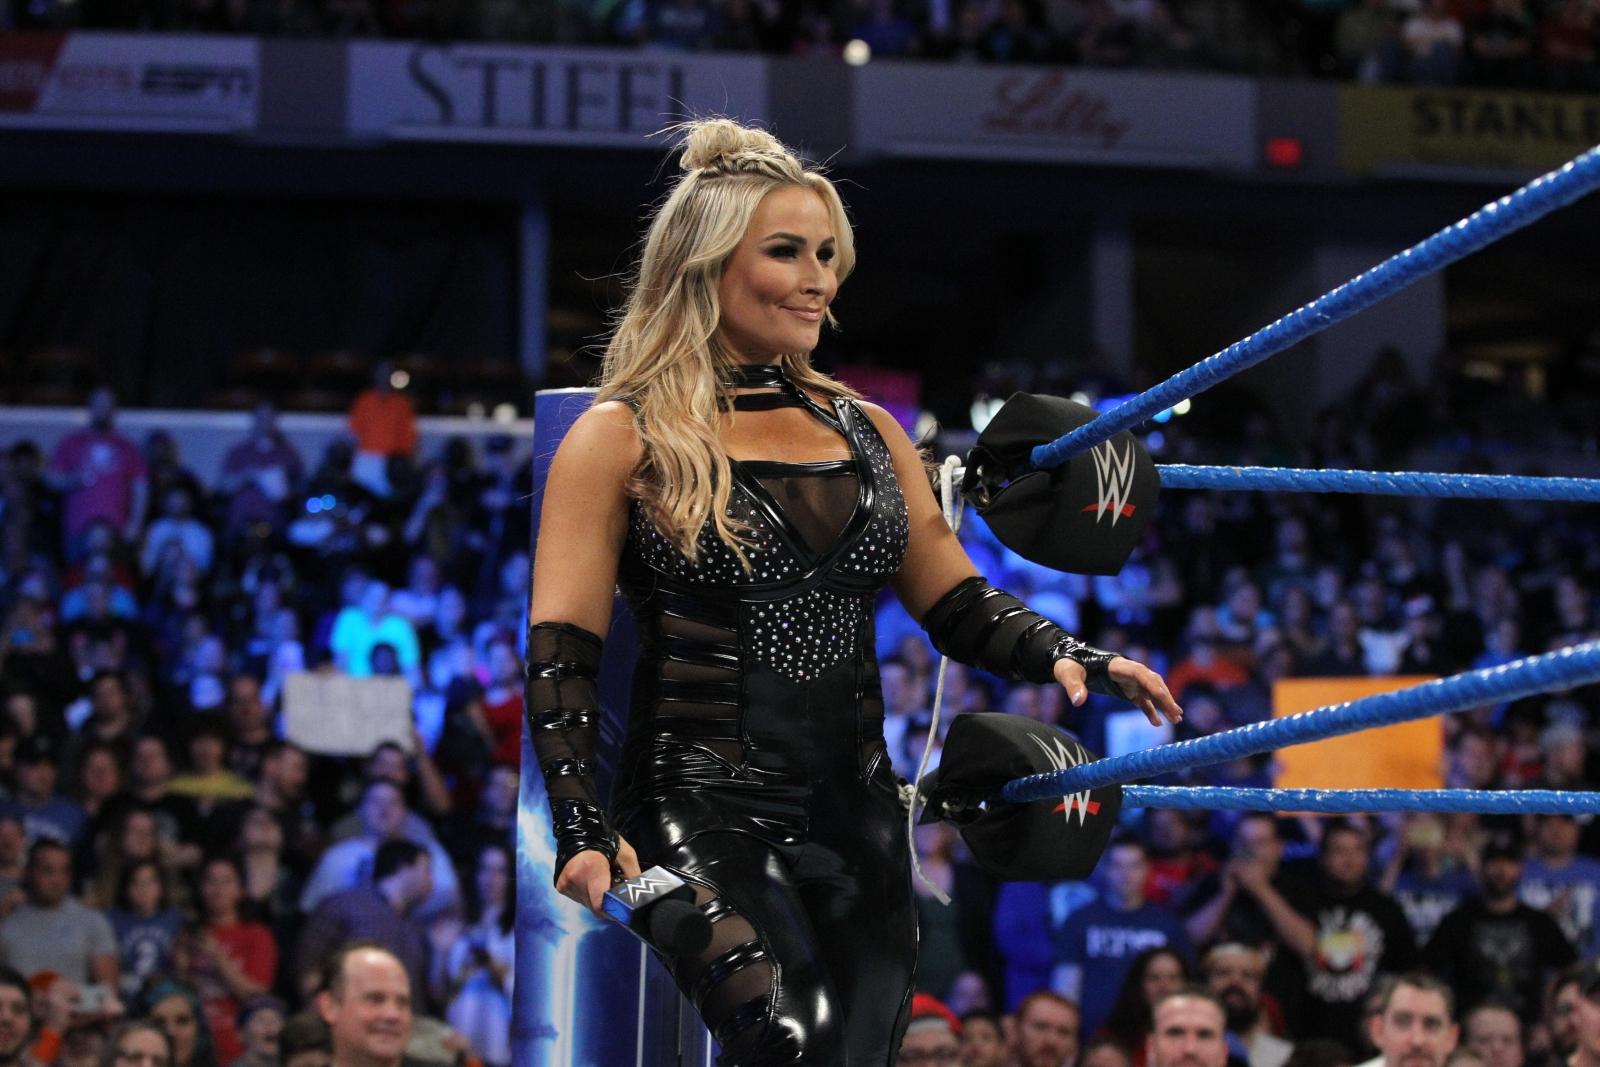 Nikki bella vs carmella no mercy 2016 - 5 1